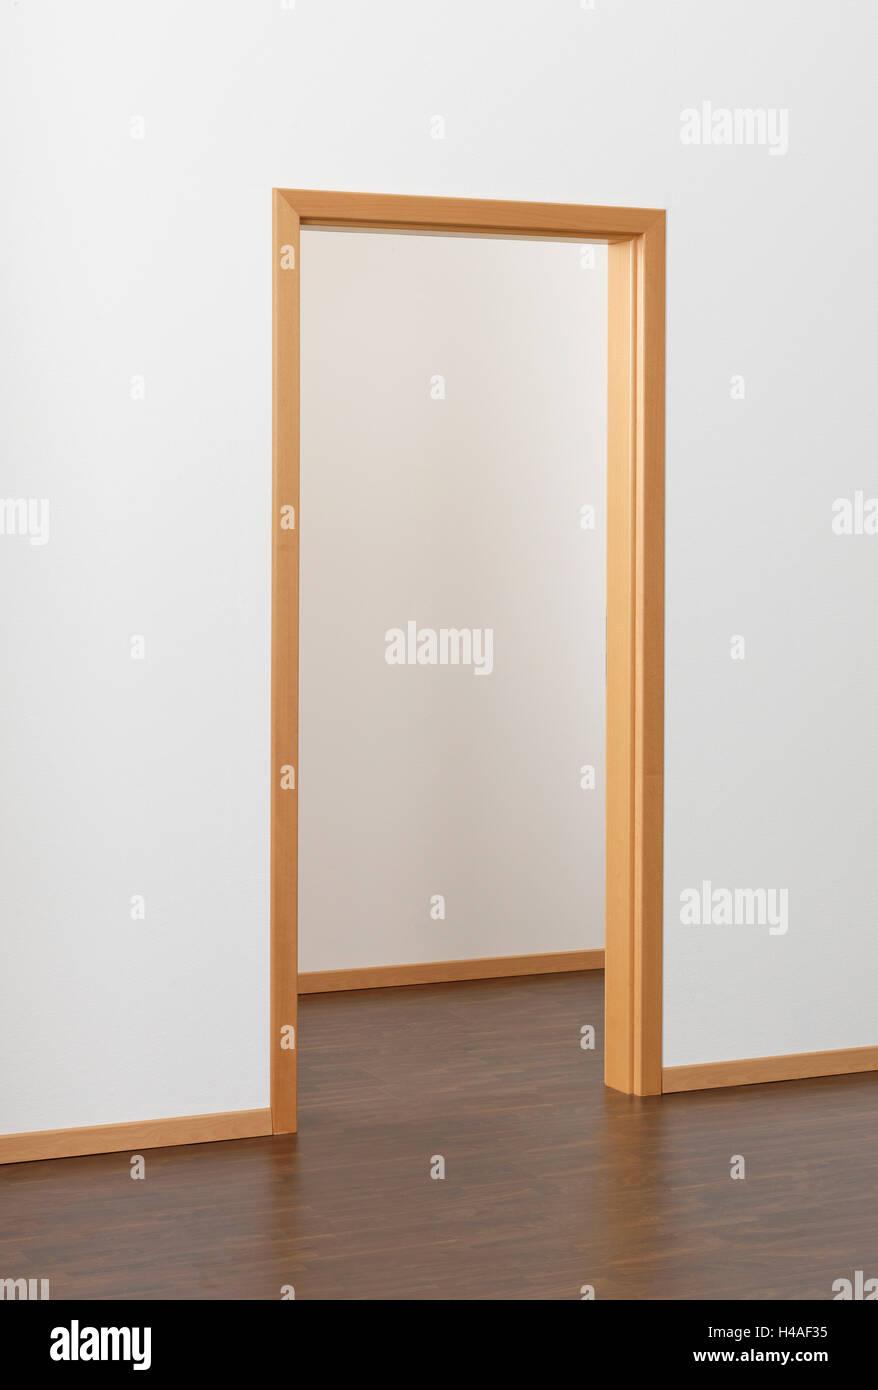 door frame installation instructions step 8 - Door Frame Installation